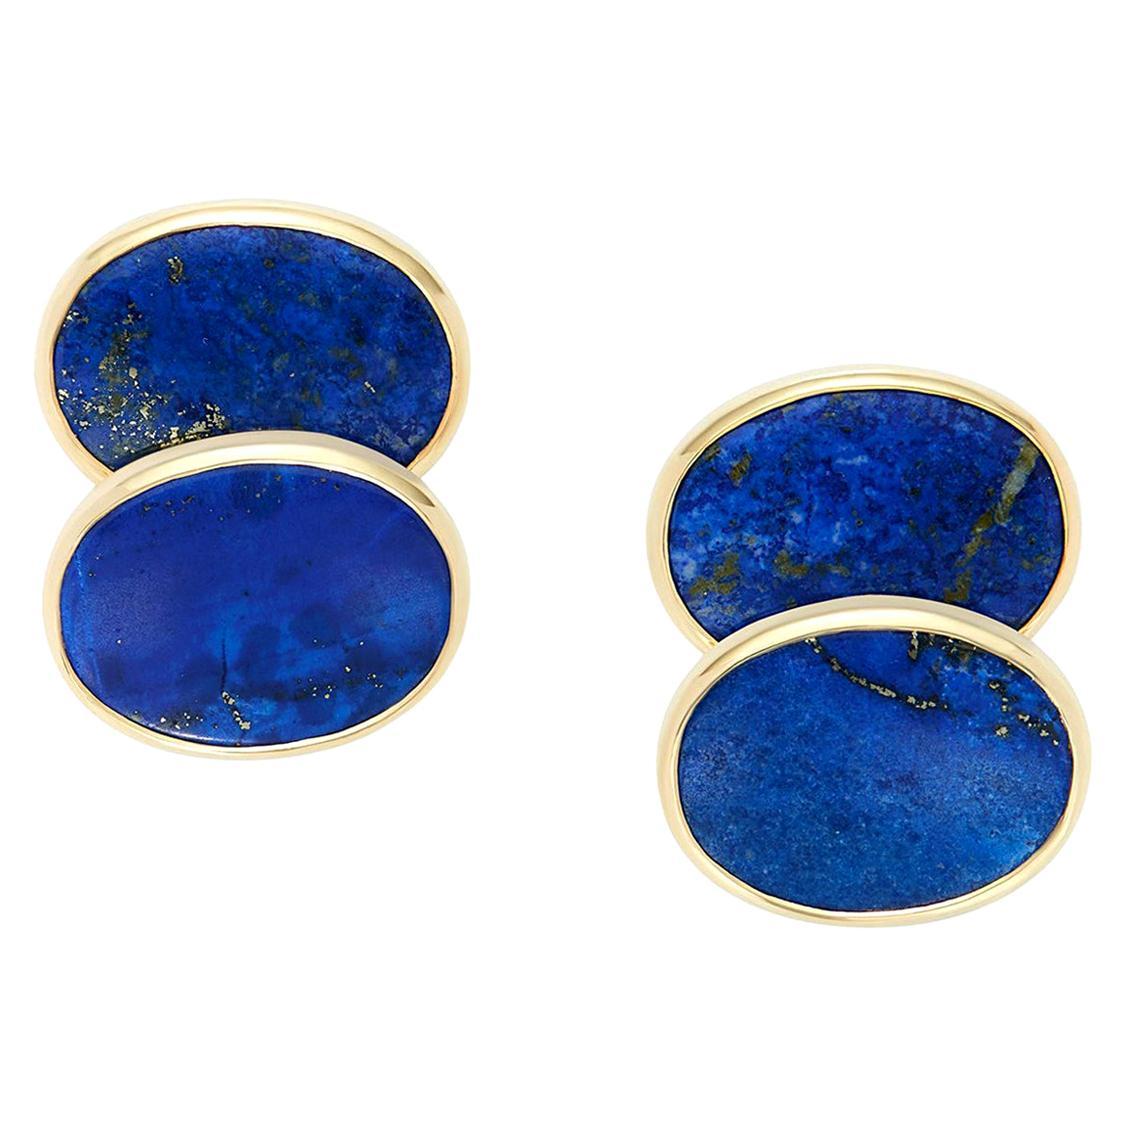 Lapis Lazuli 18 Karat Yellow Gold Oval Cufflinks